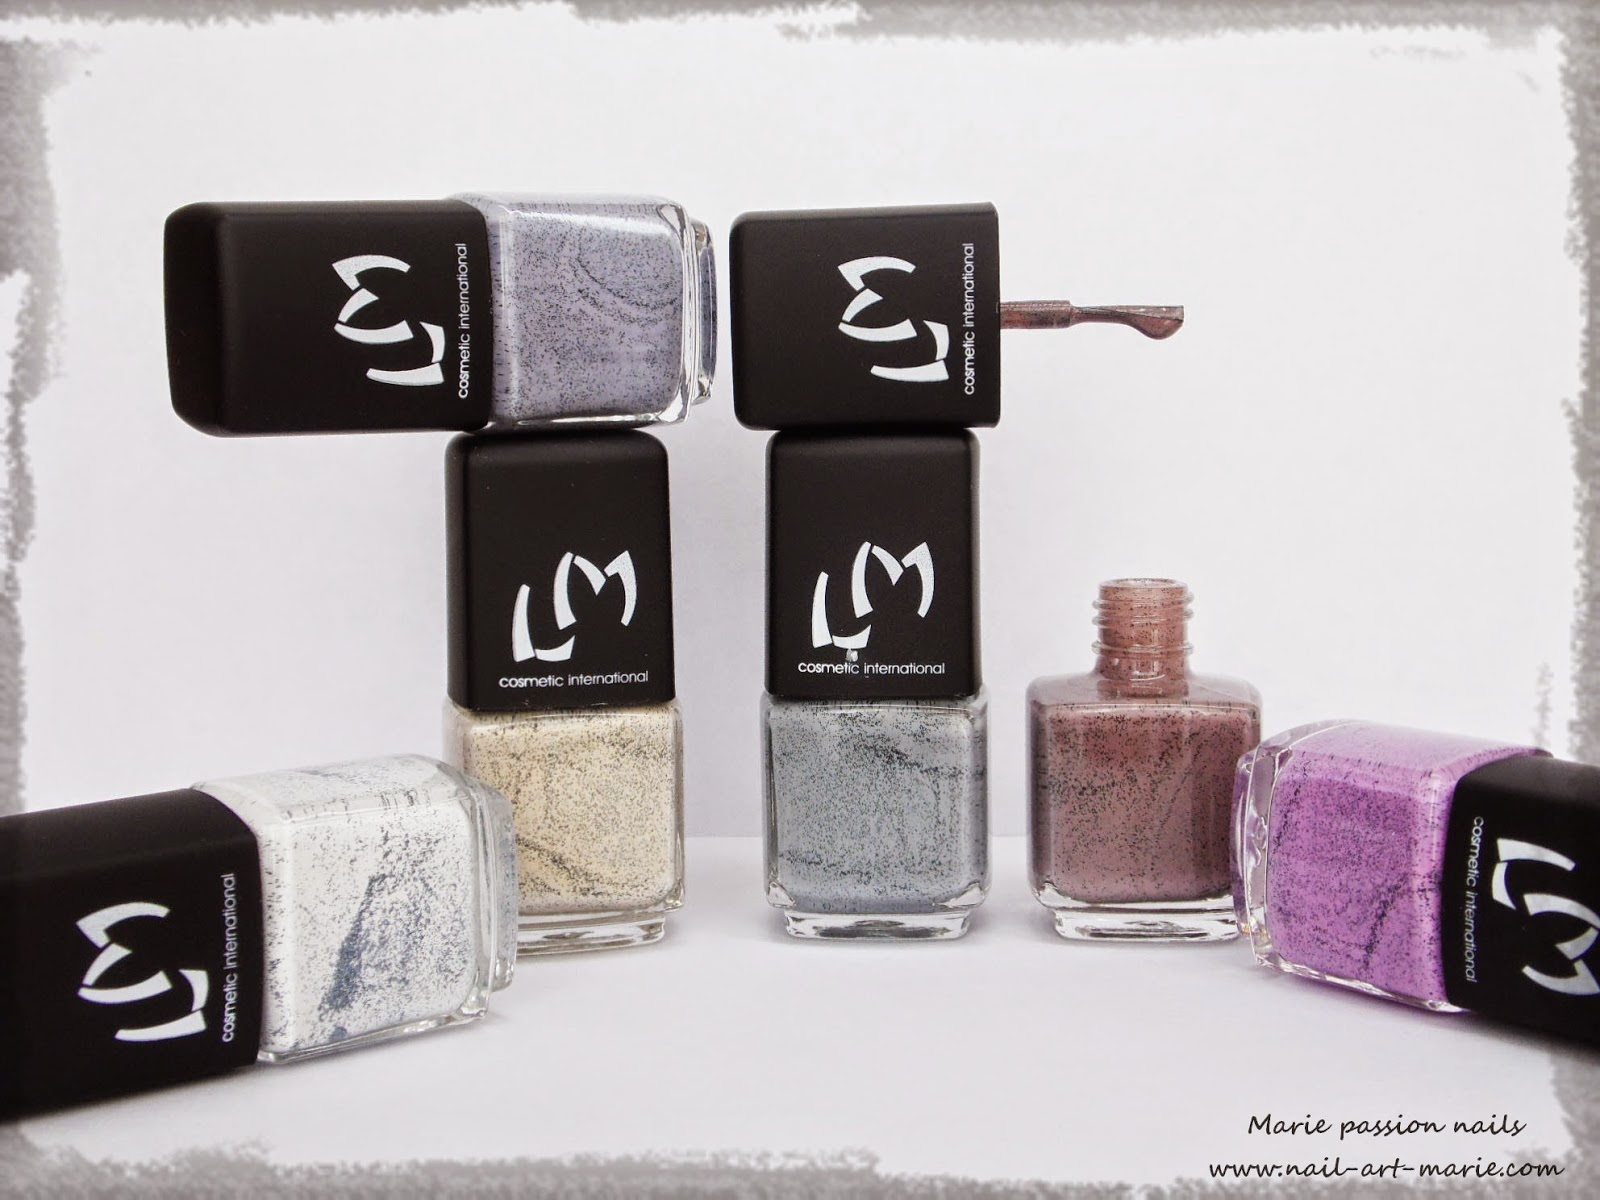 LM Cosmetic Les Granites